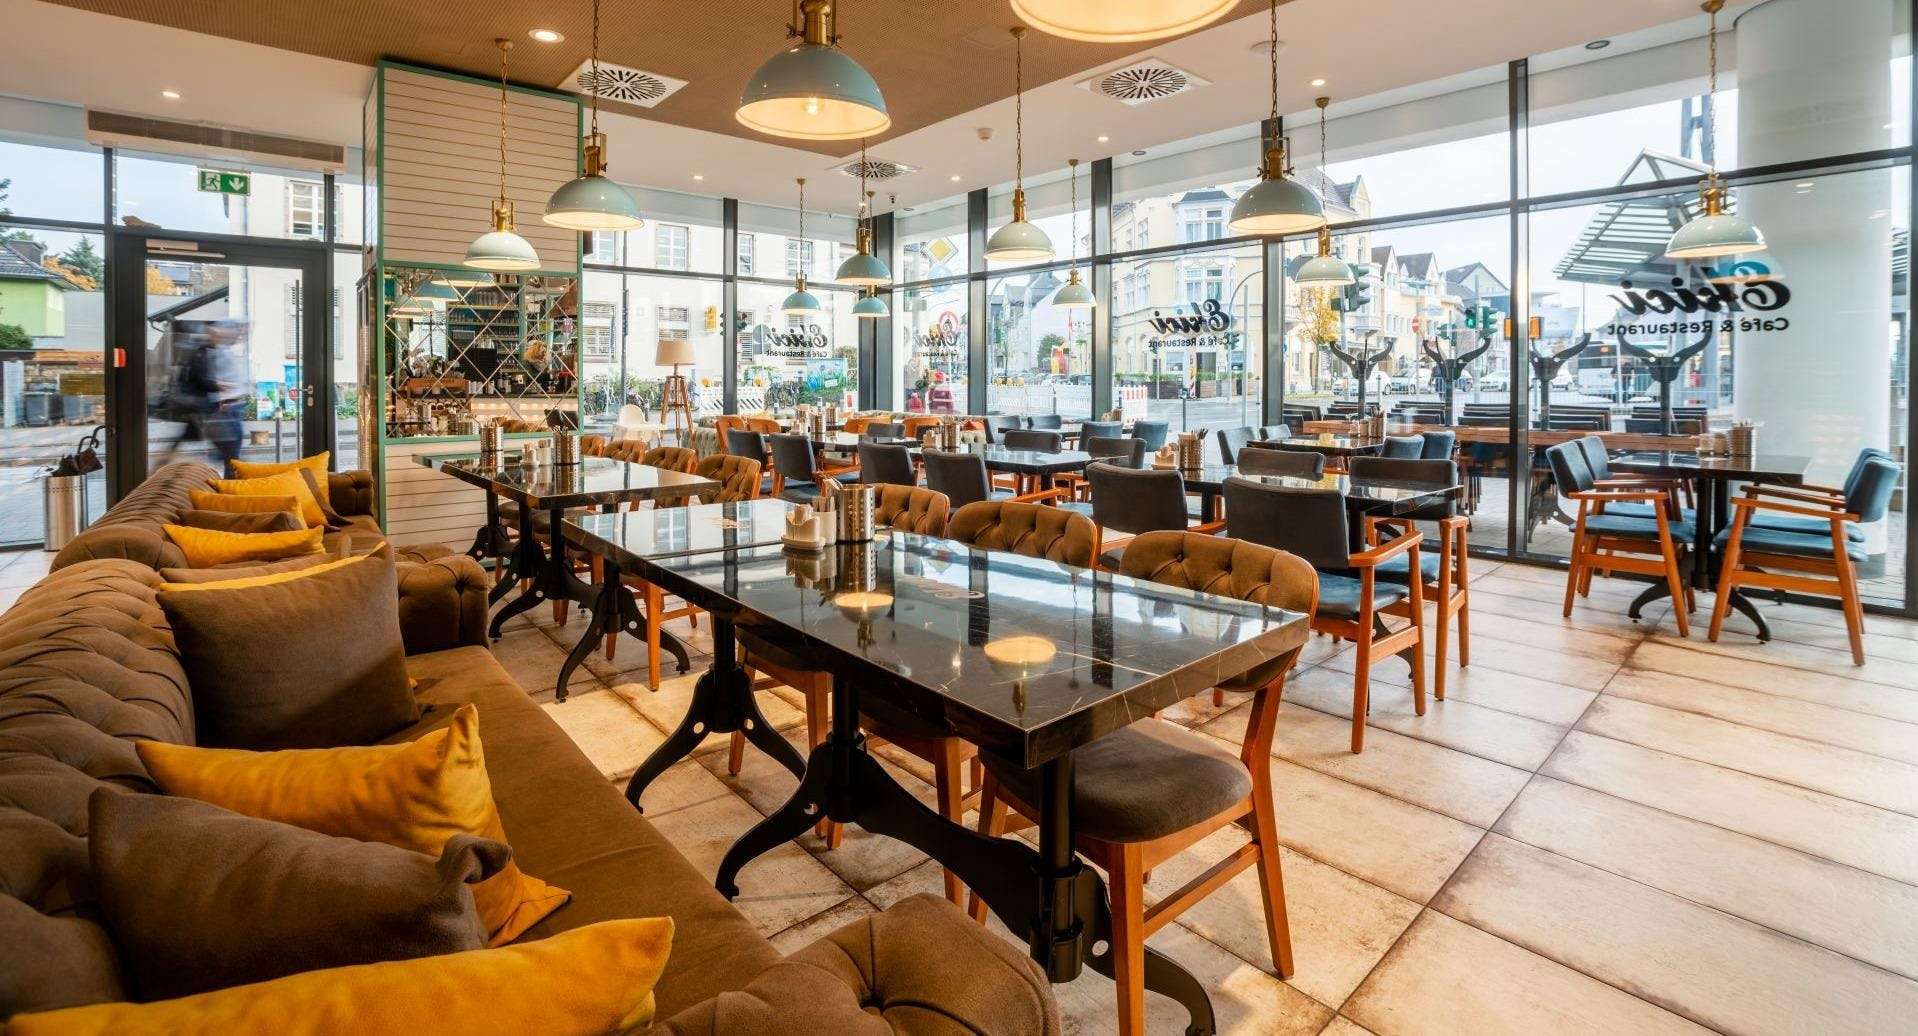 Ekici Café & Restaurant